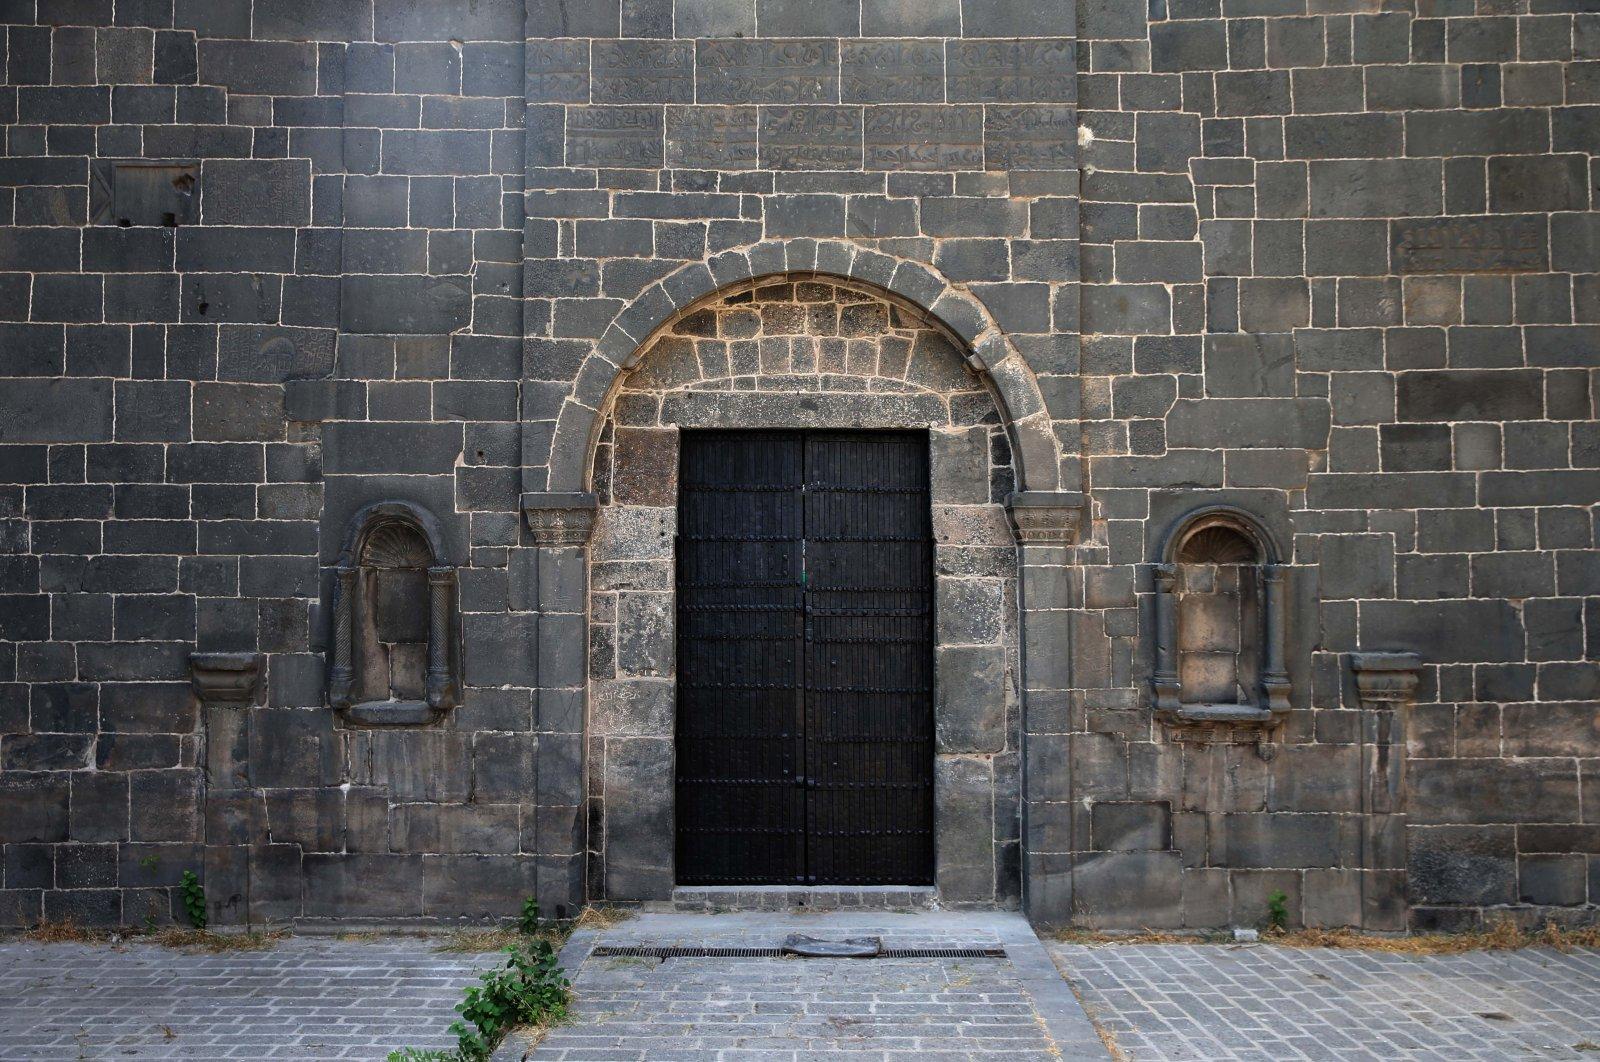 The Dağkapı (mountain gate) in the historical city walls of Diyarbakır, Turkey, July 2, 2021. (AA Photo)